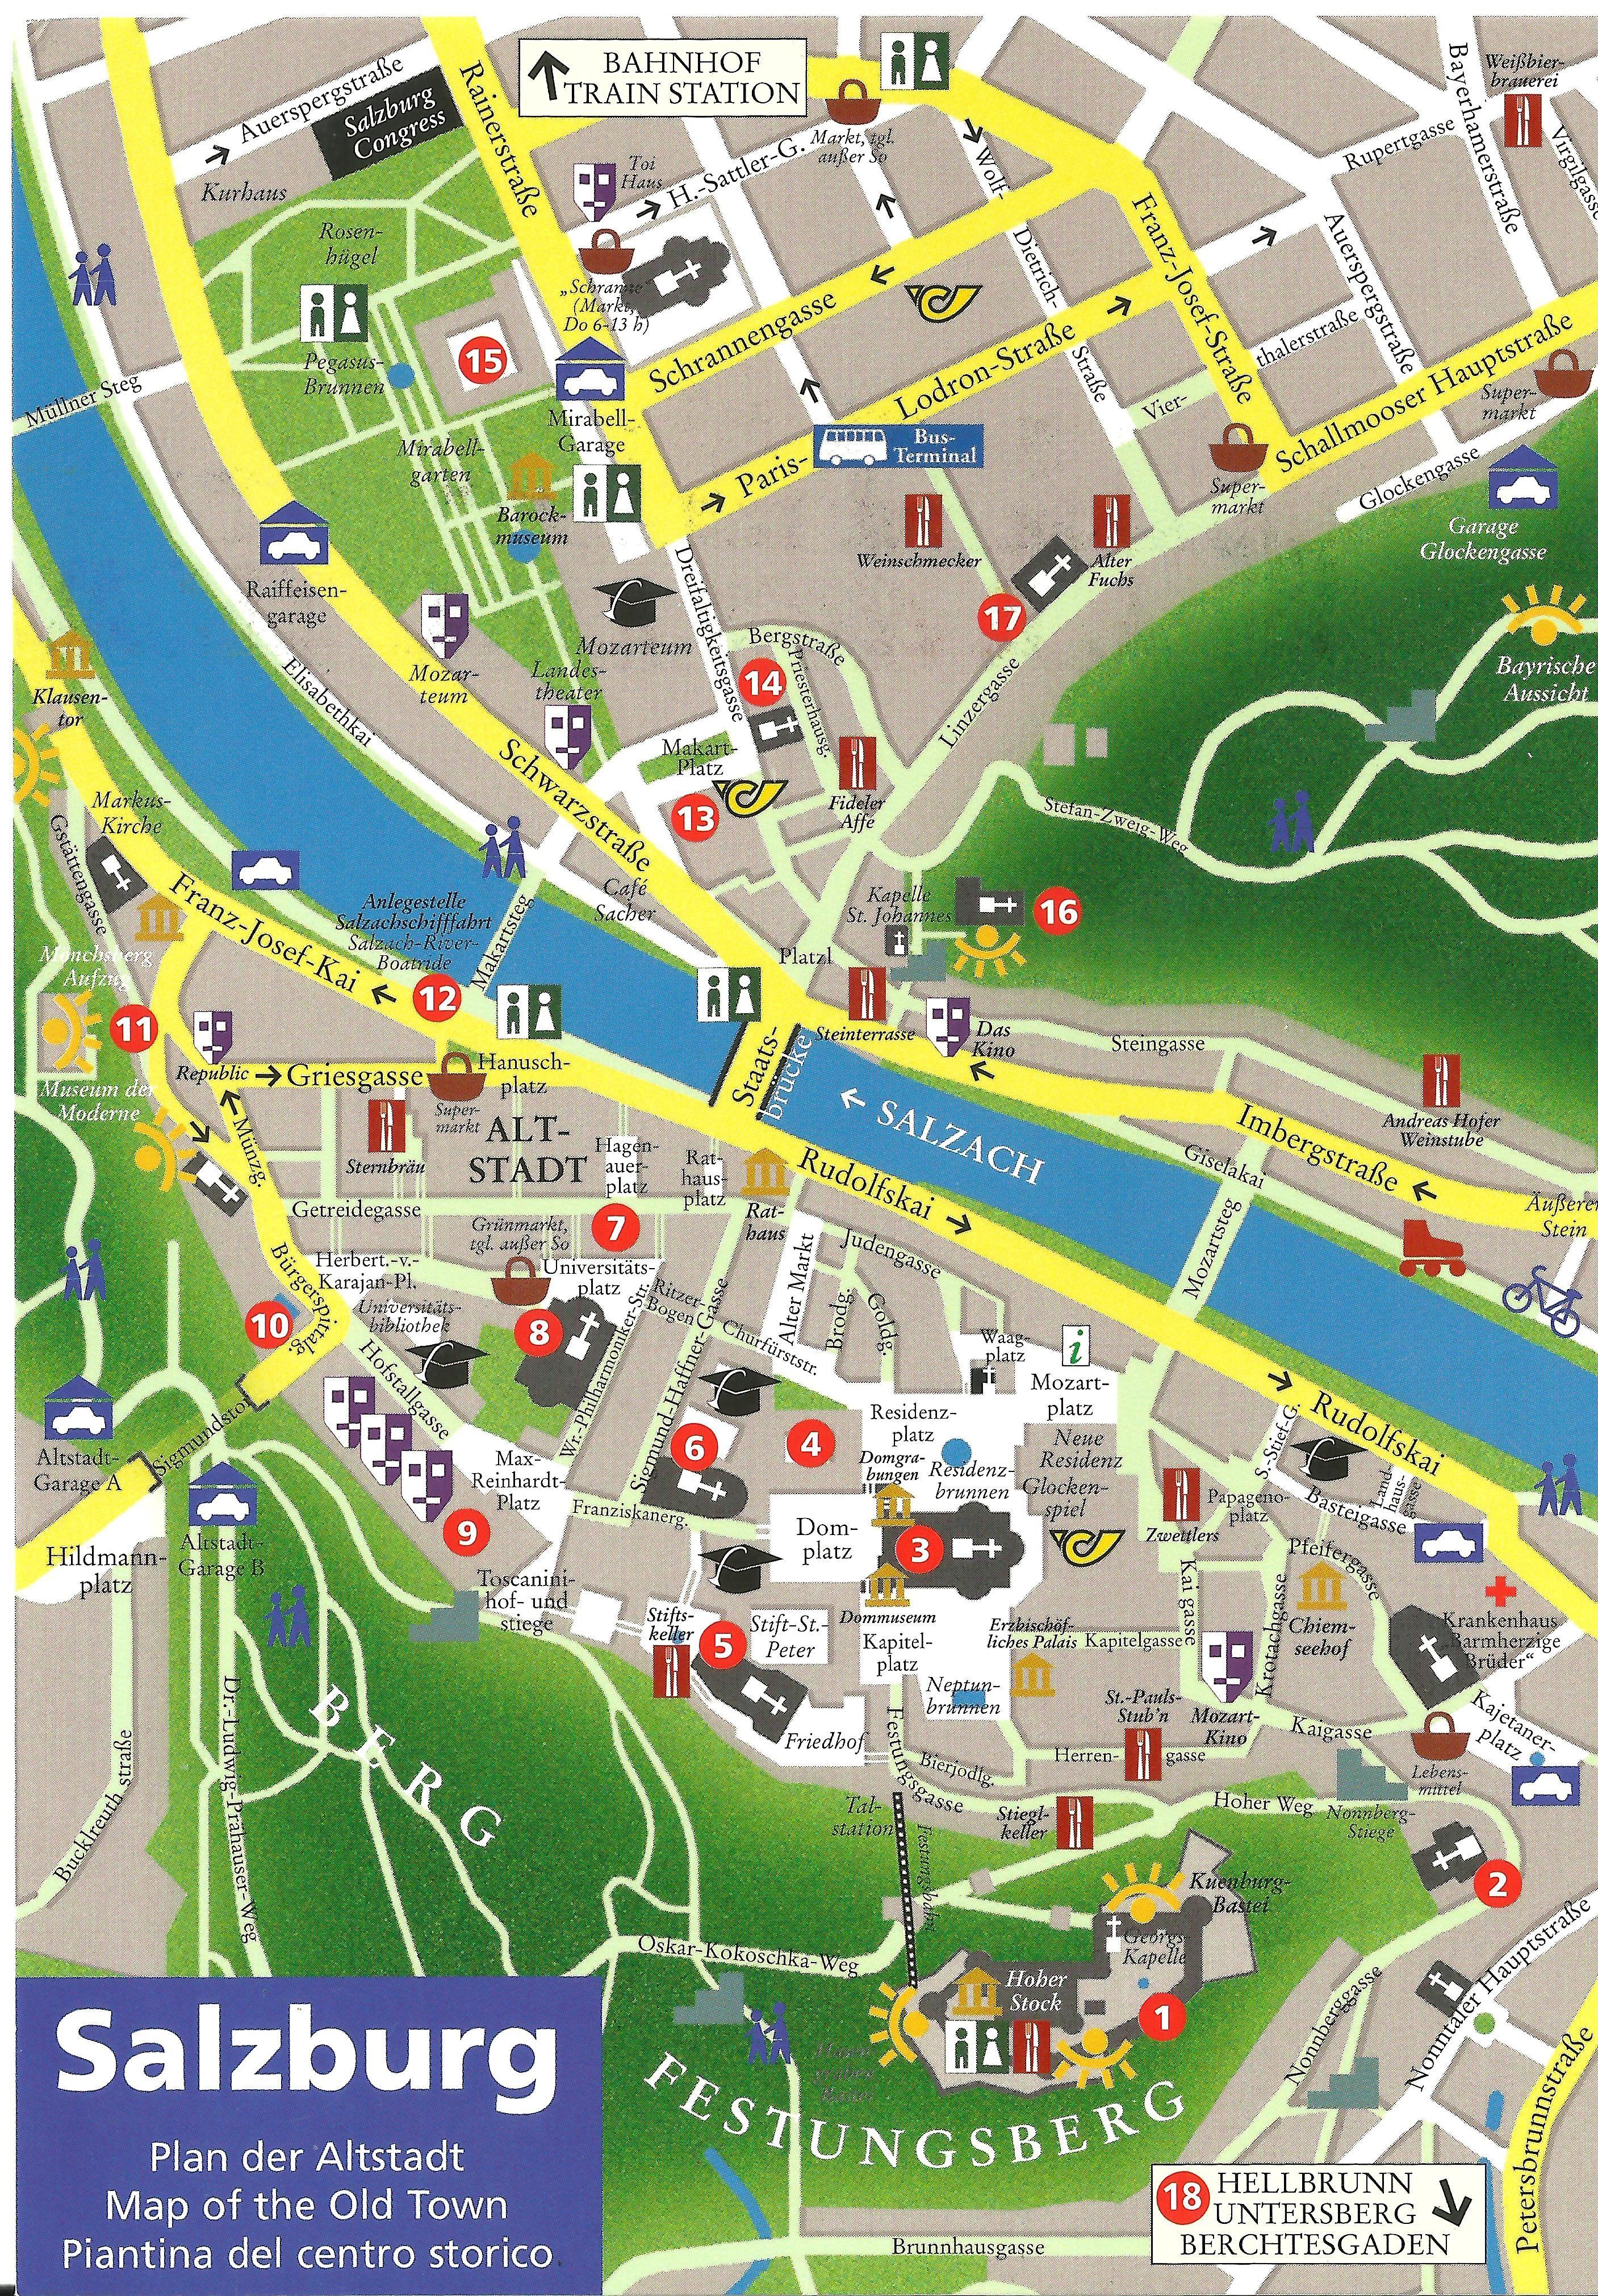 Salzburg map Where you should go Salzburg Pinterest